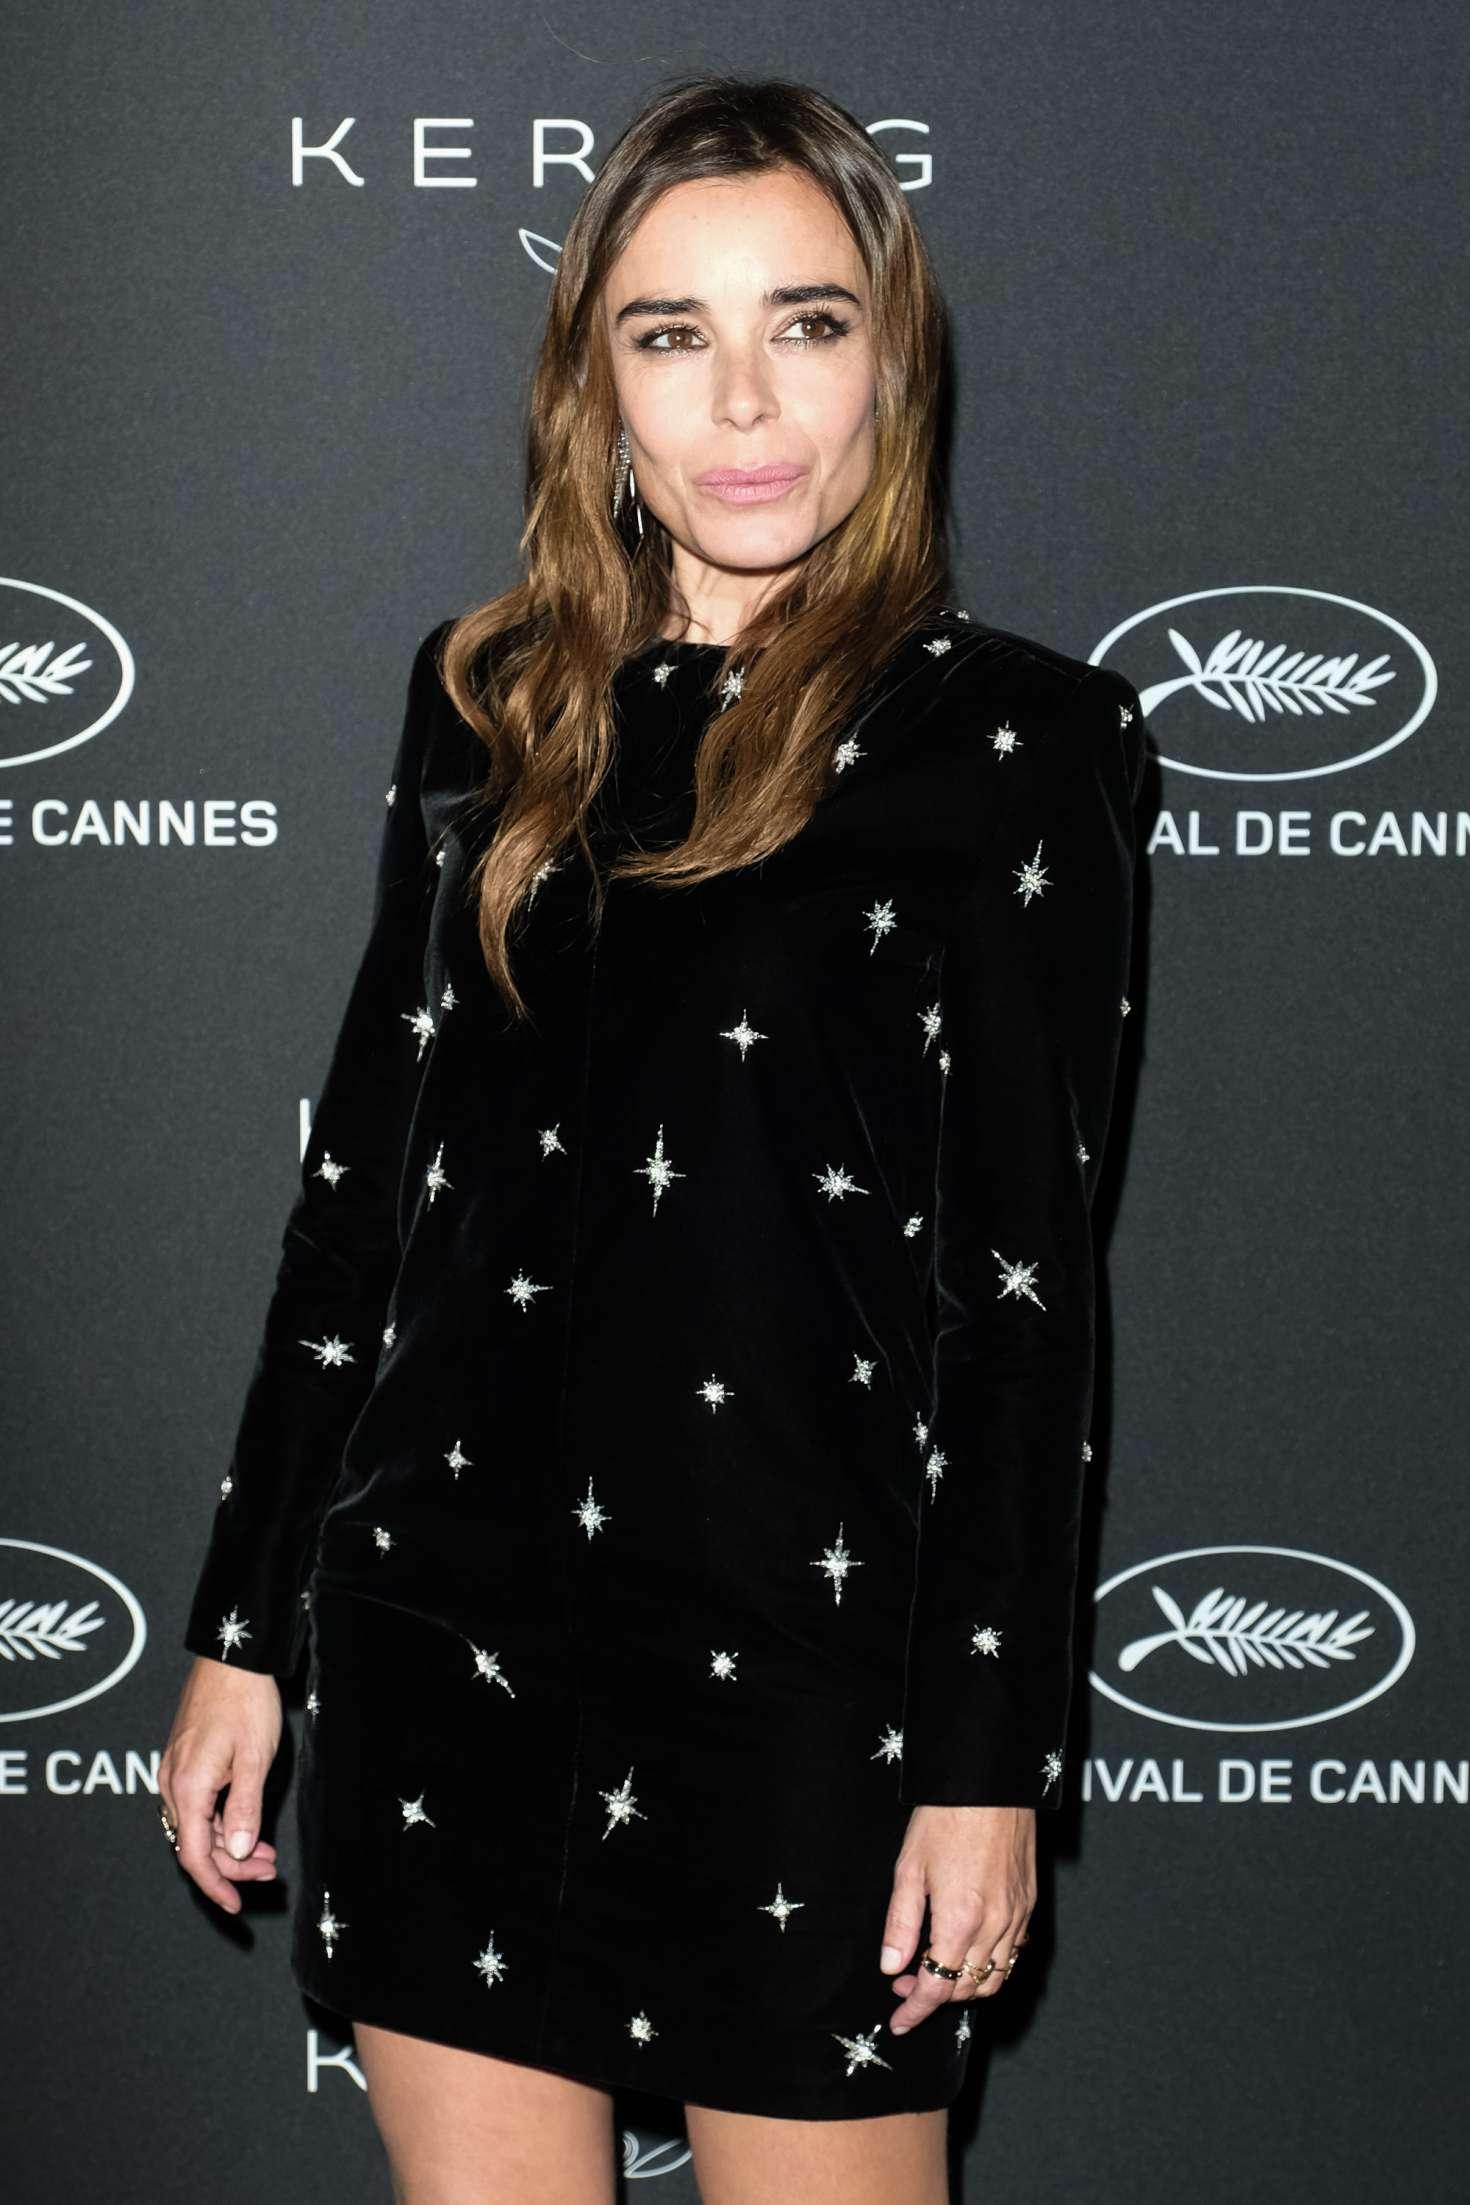 Elodie Bouchez - Kering Women in Motion Awards Dinner at 2018 Cannes Film Festival